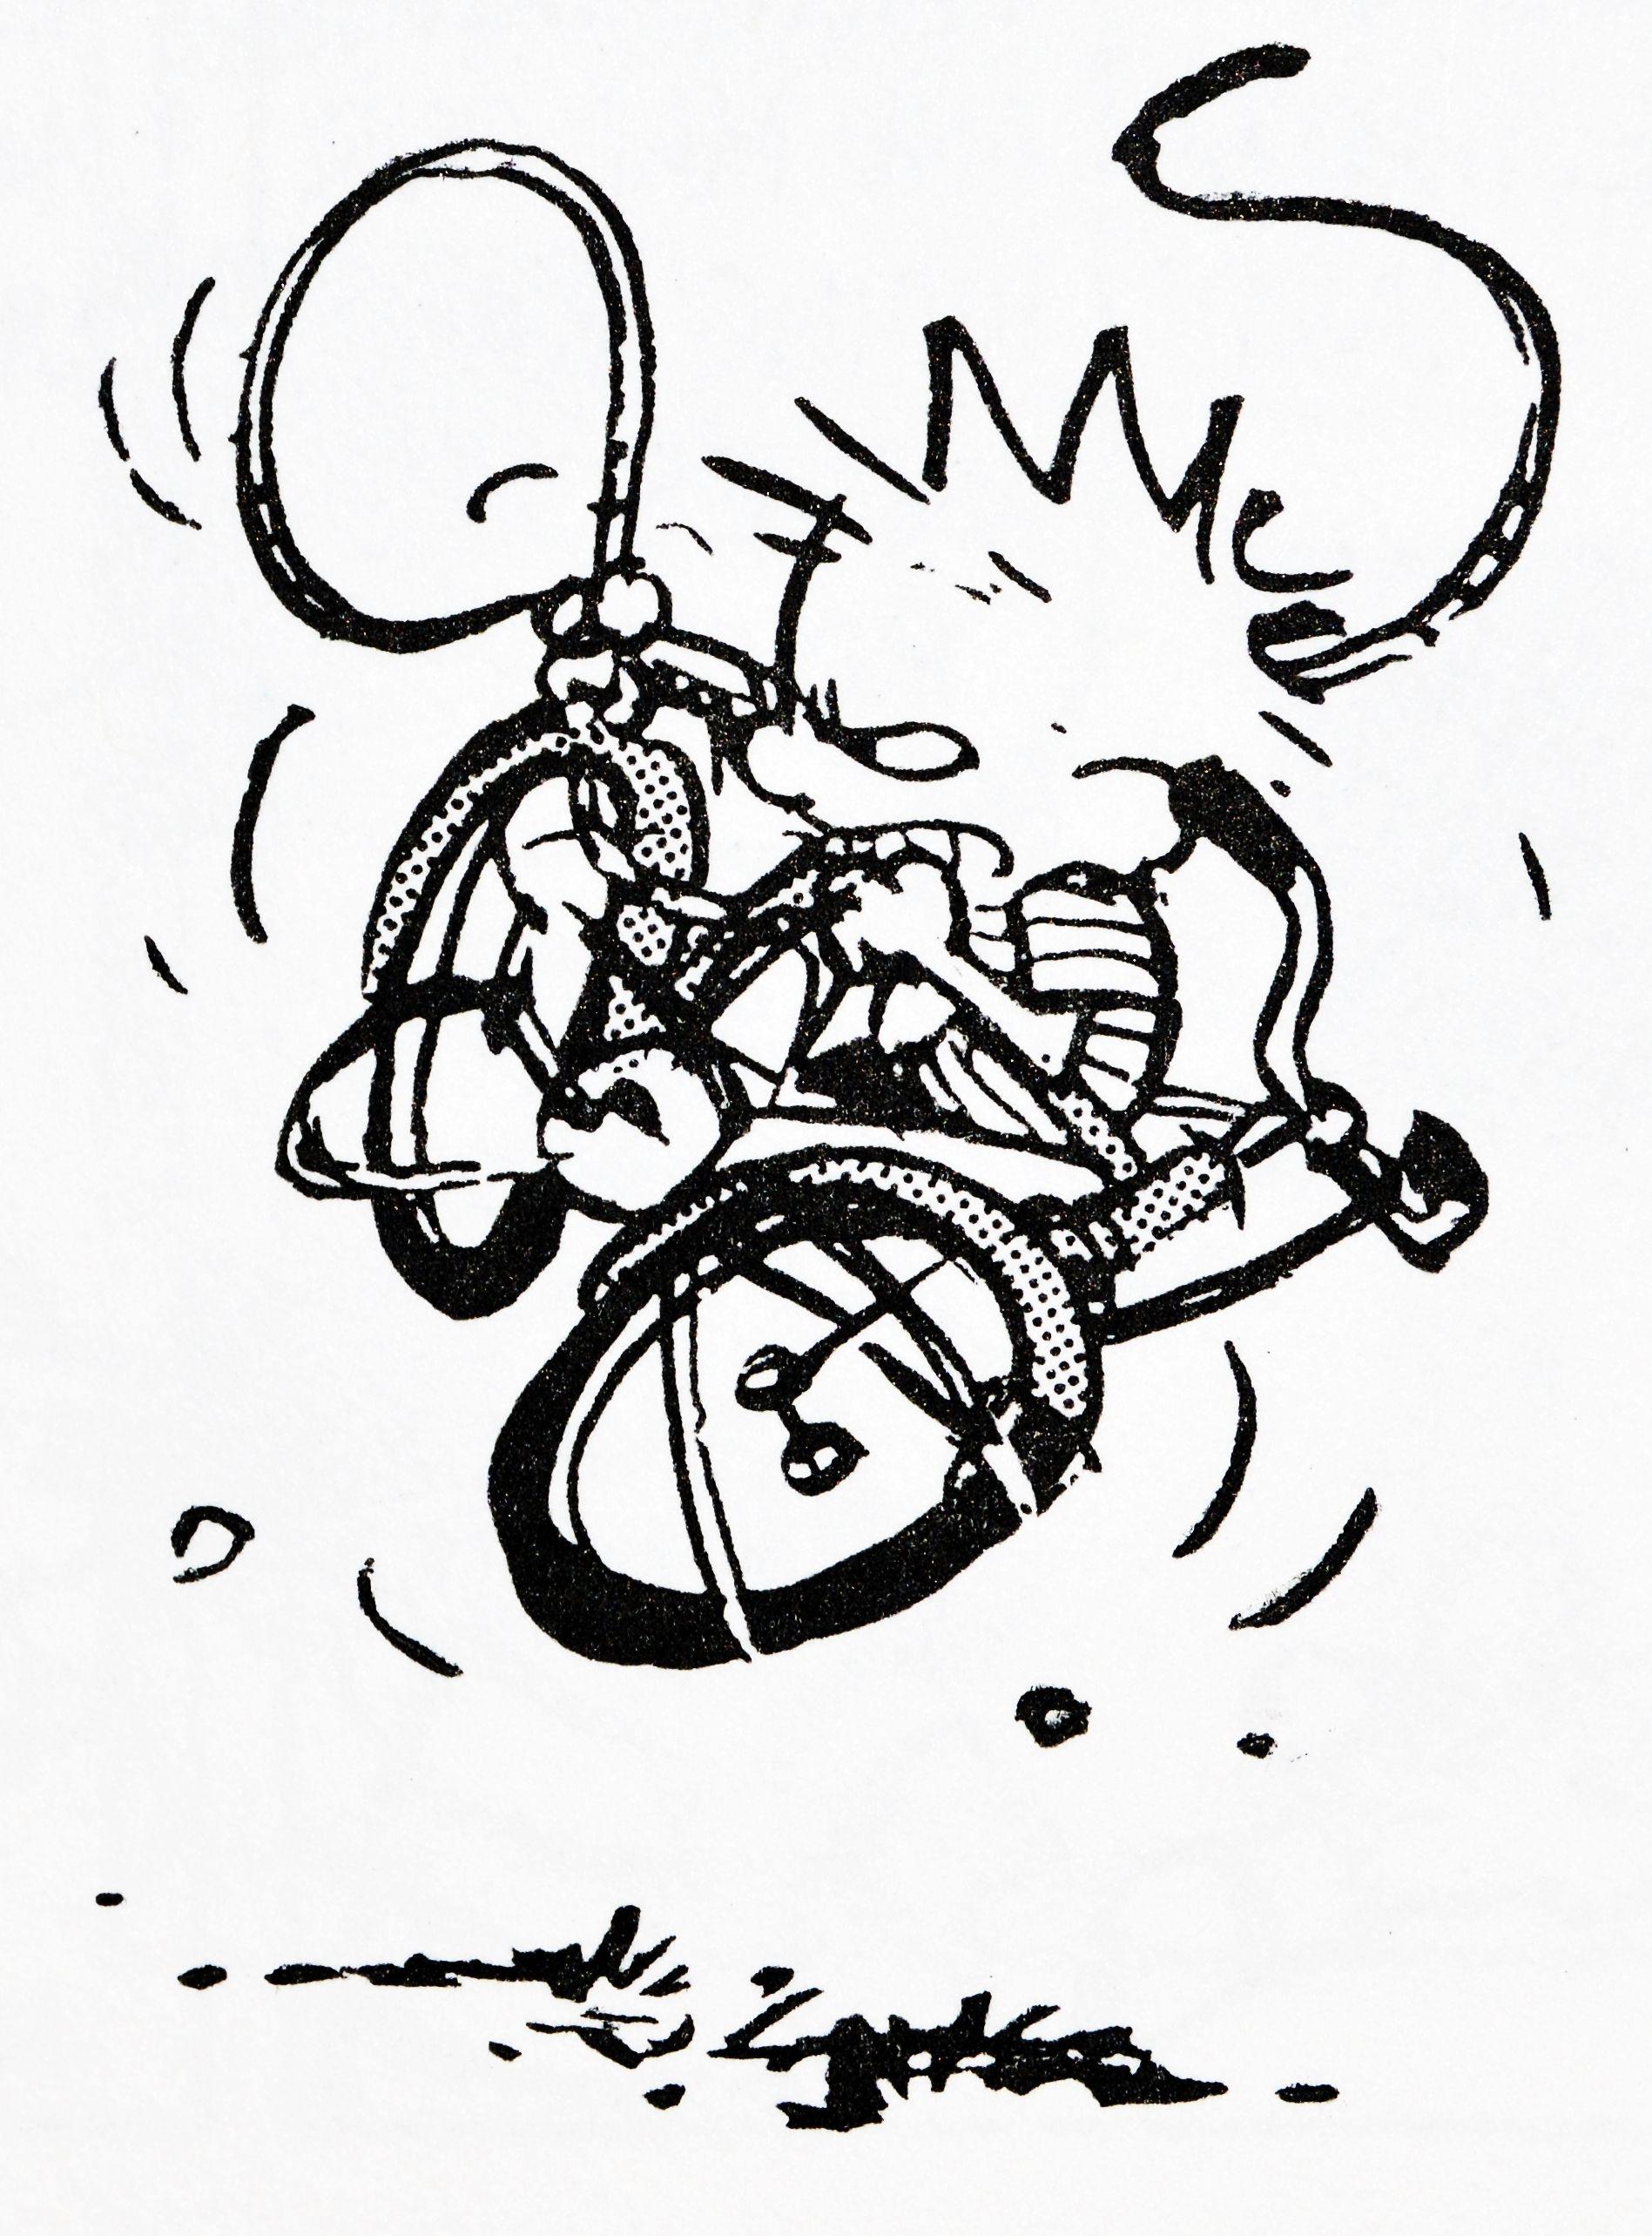 Calvin and Hobbes (DA) - the bike strikes again